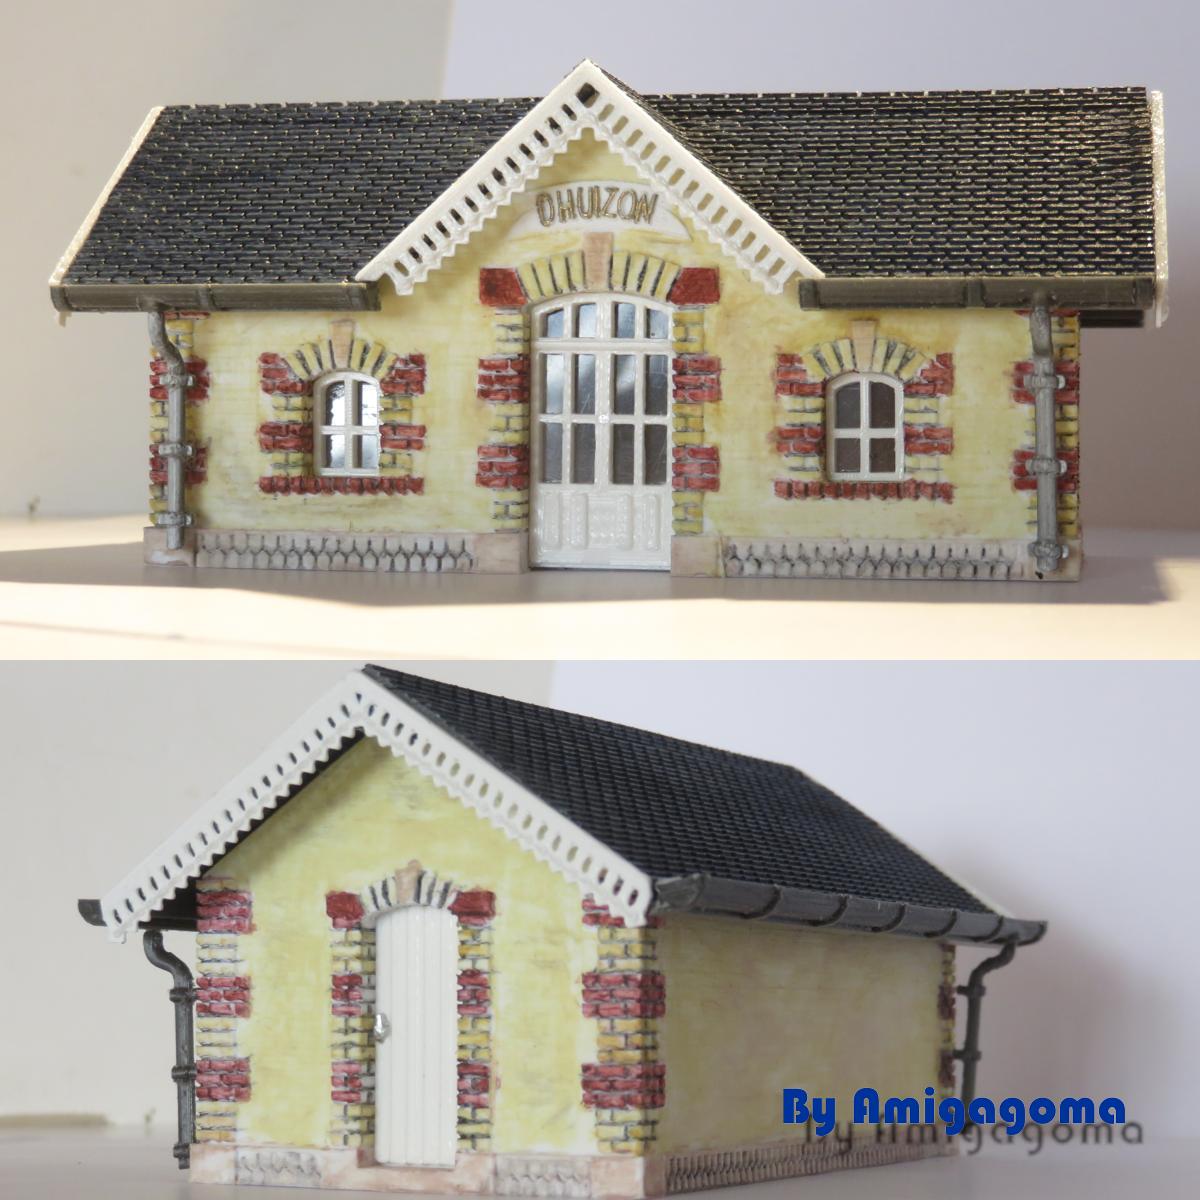 lagare.png Download STL file Dhuizon Station • 3D printing design, amigapocket